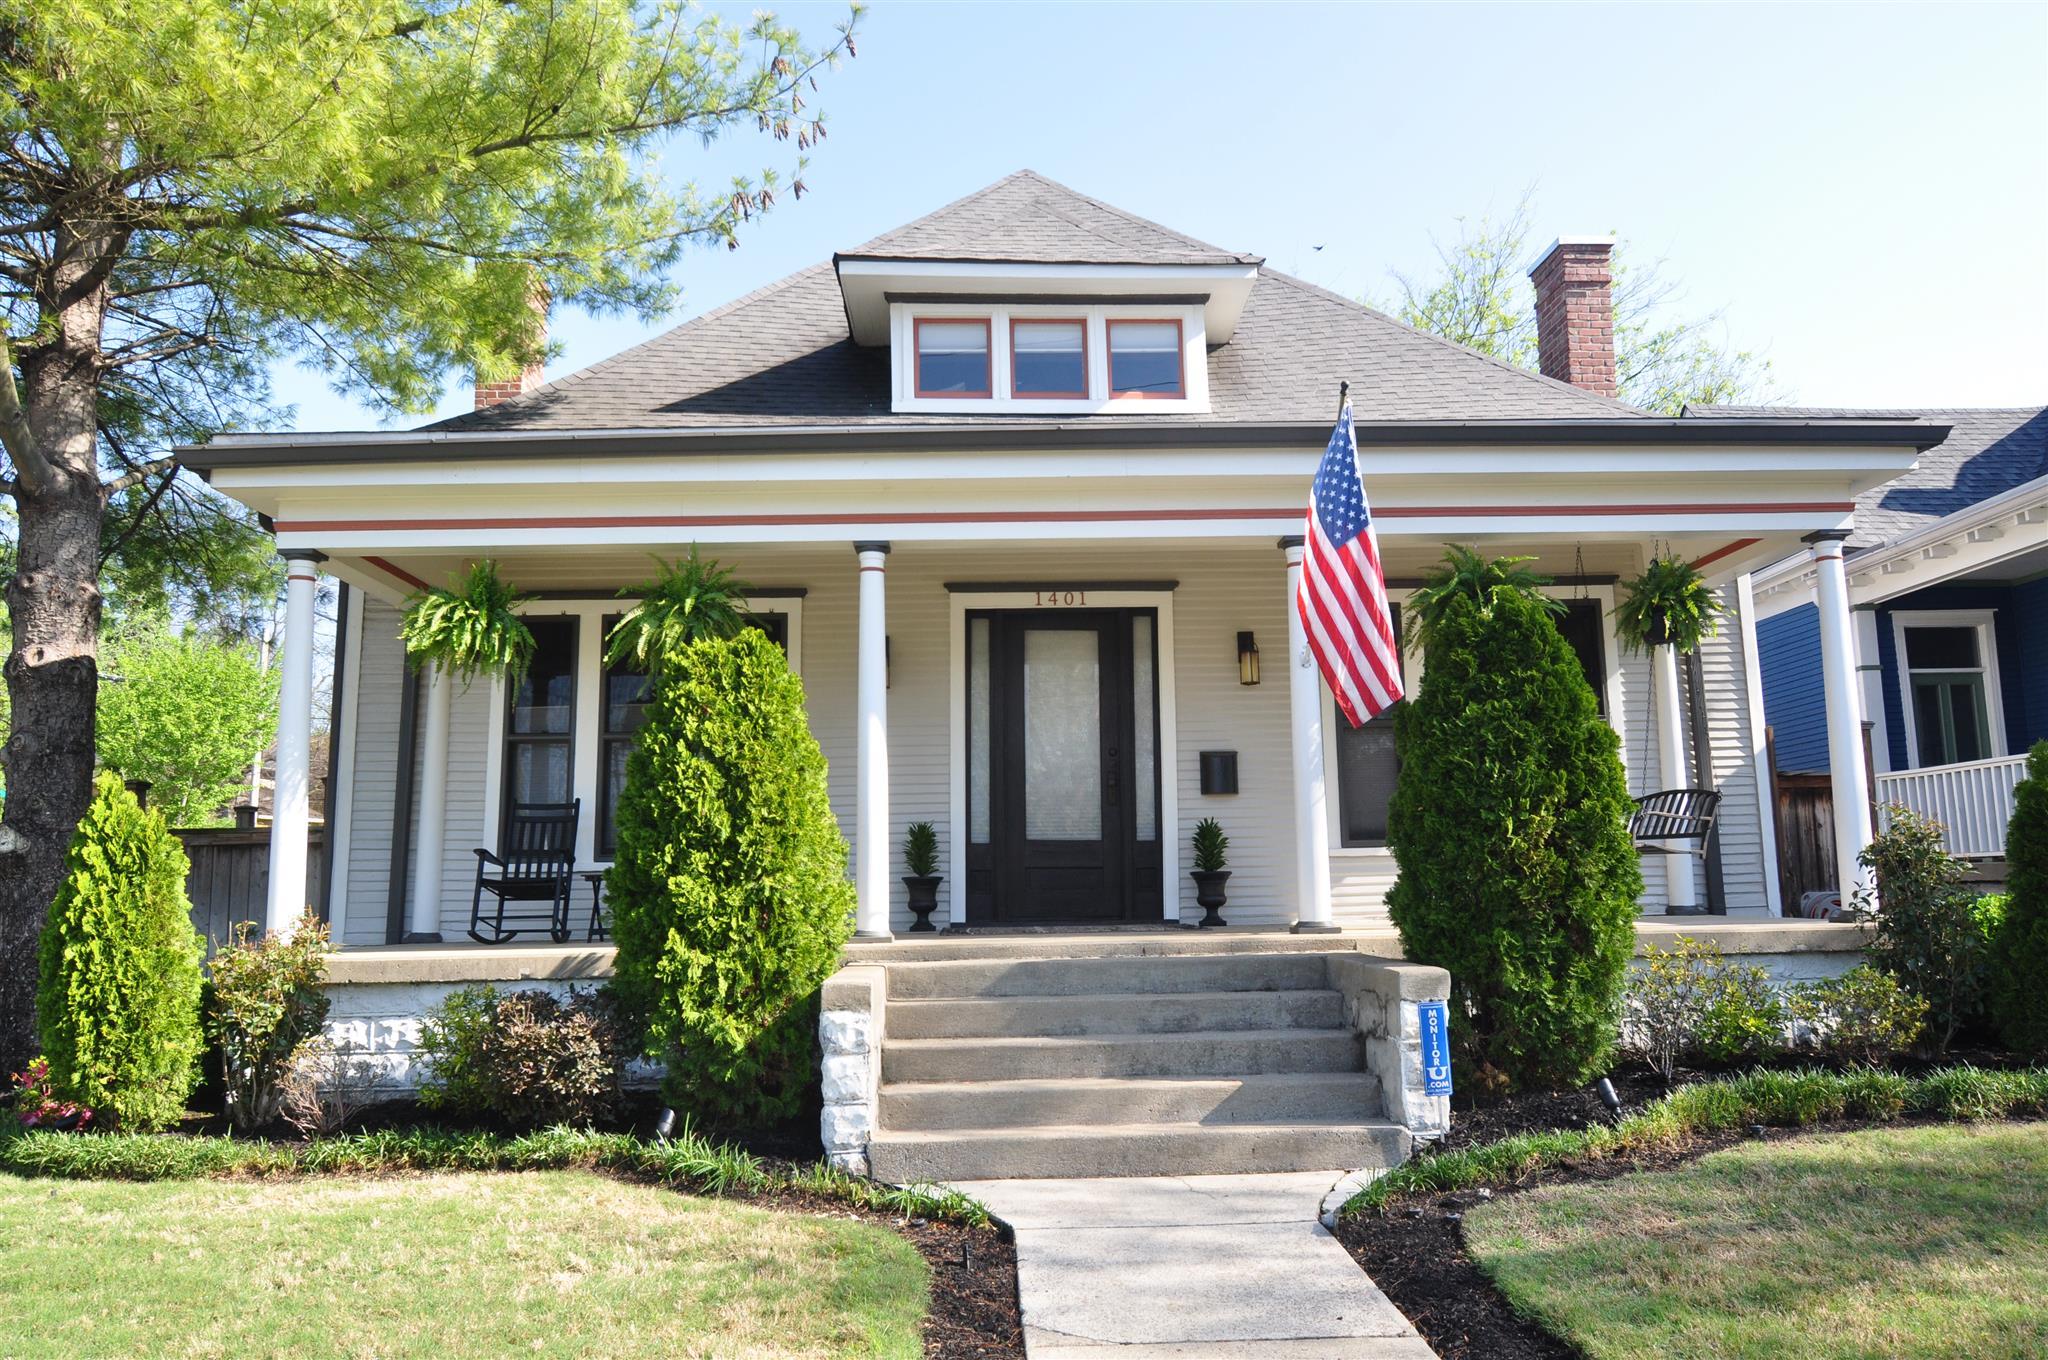 1401 Forrest Ave, Nashville, TN 37206